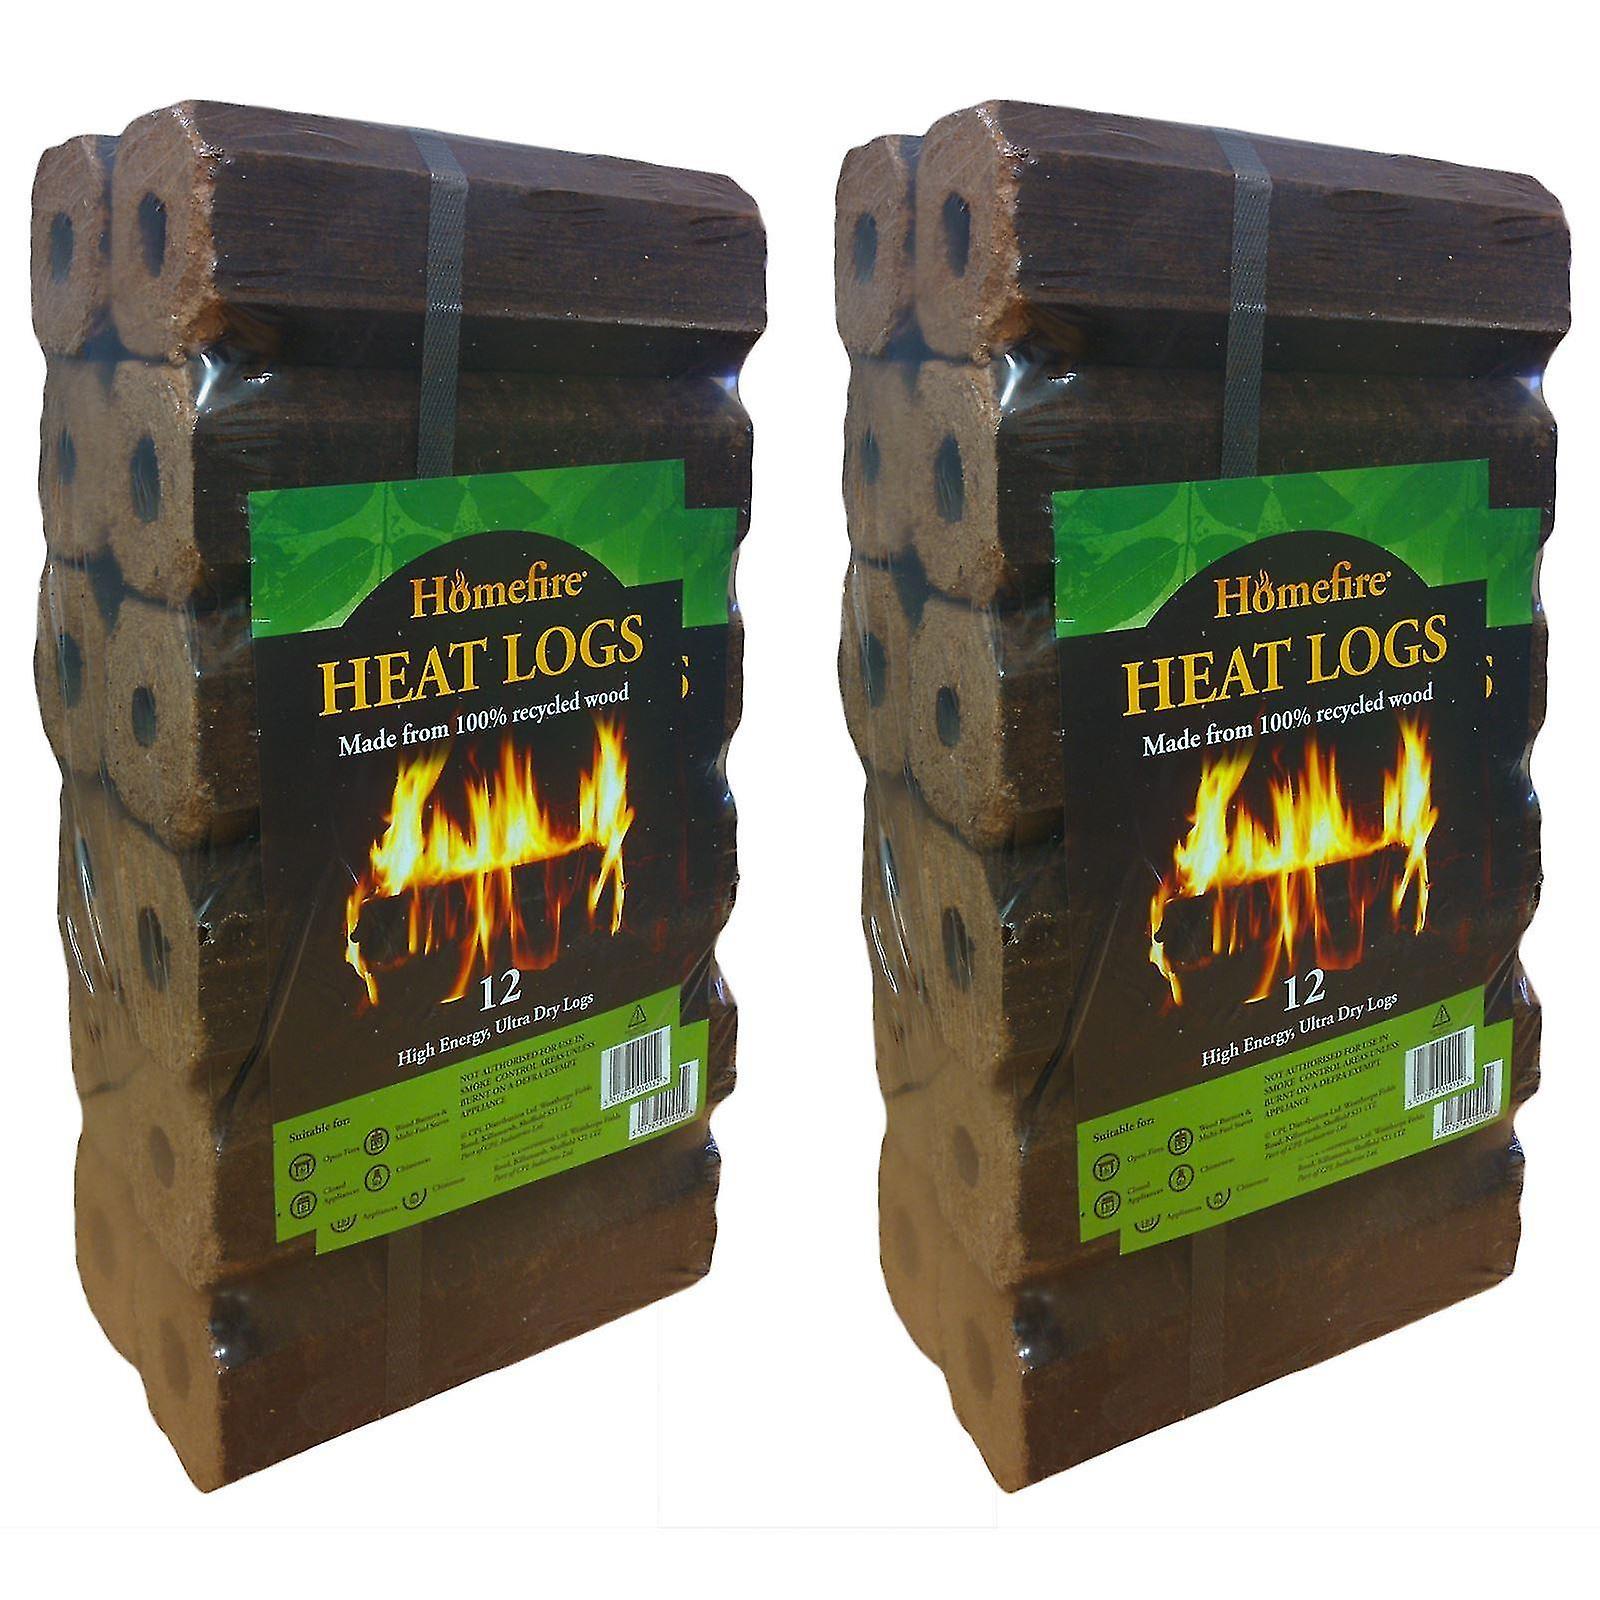 Homefire 12 High Energy Ultra Dry Heat Logs (2 Pack)